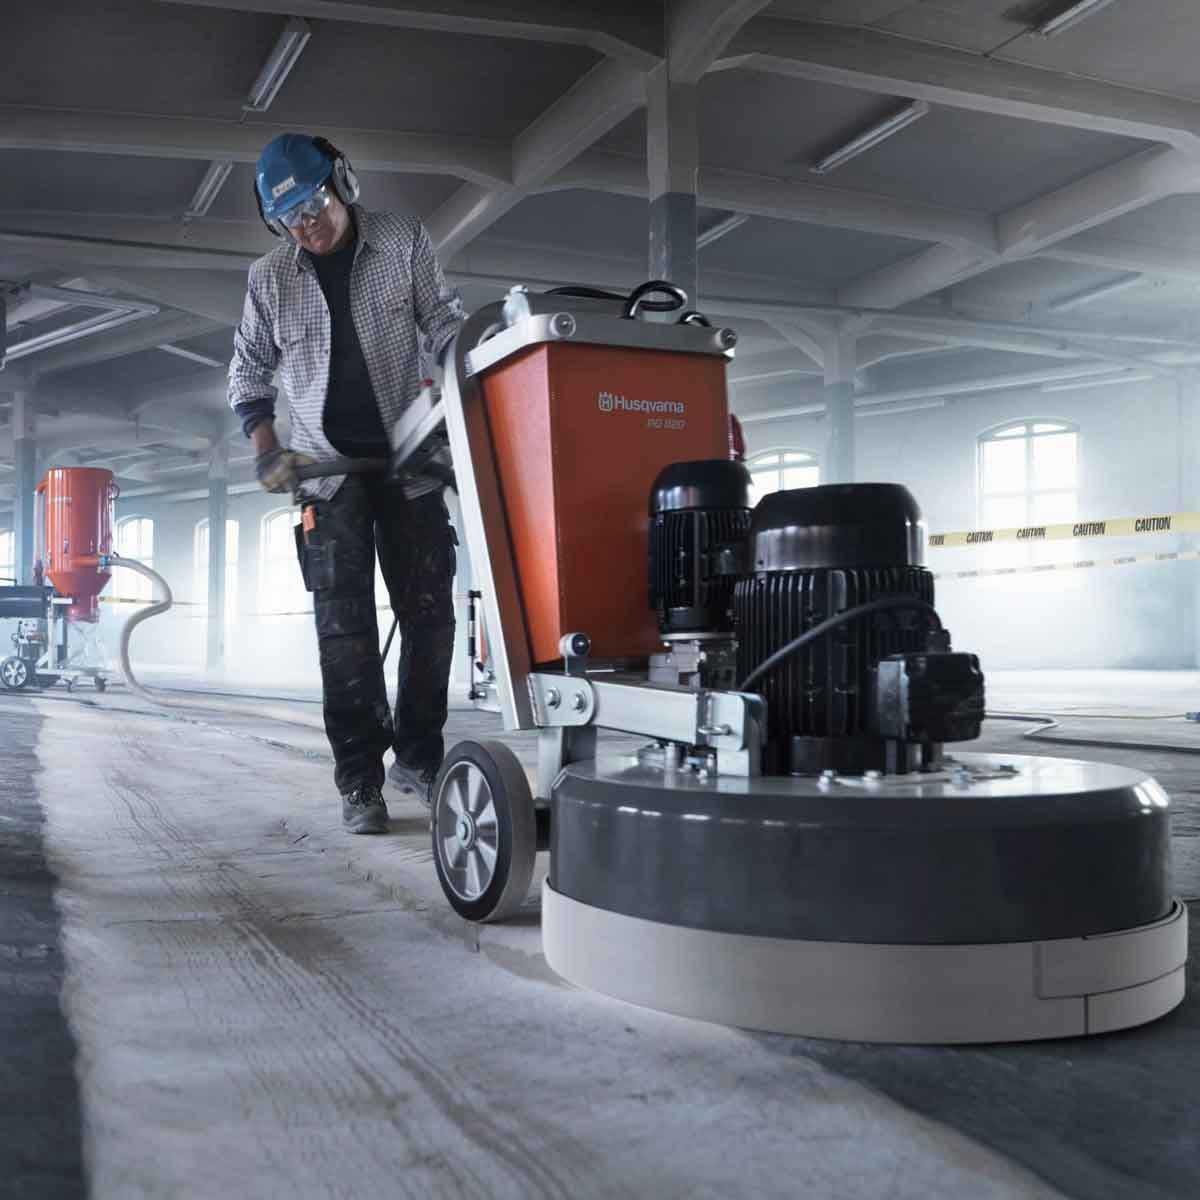 Husqvarna PG 820 concrete grinding